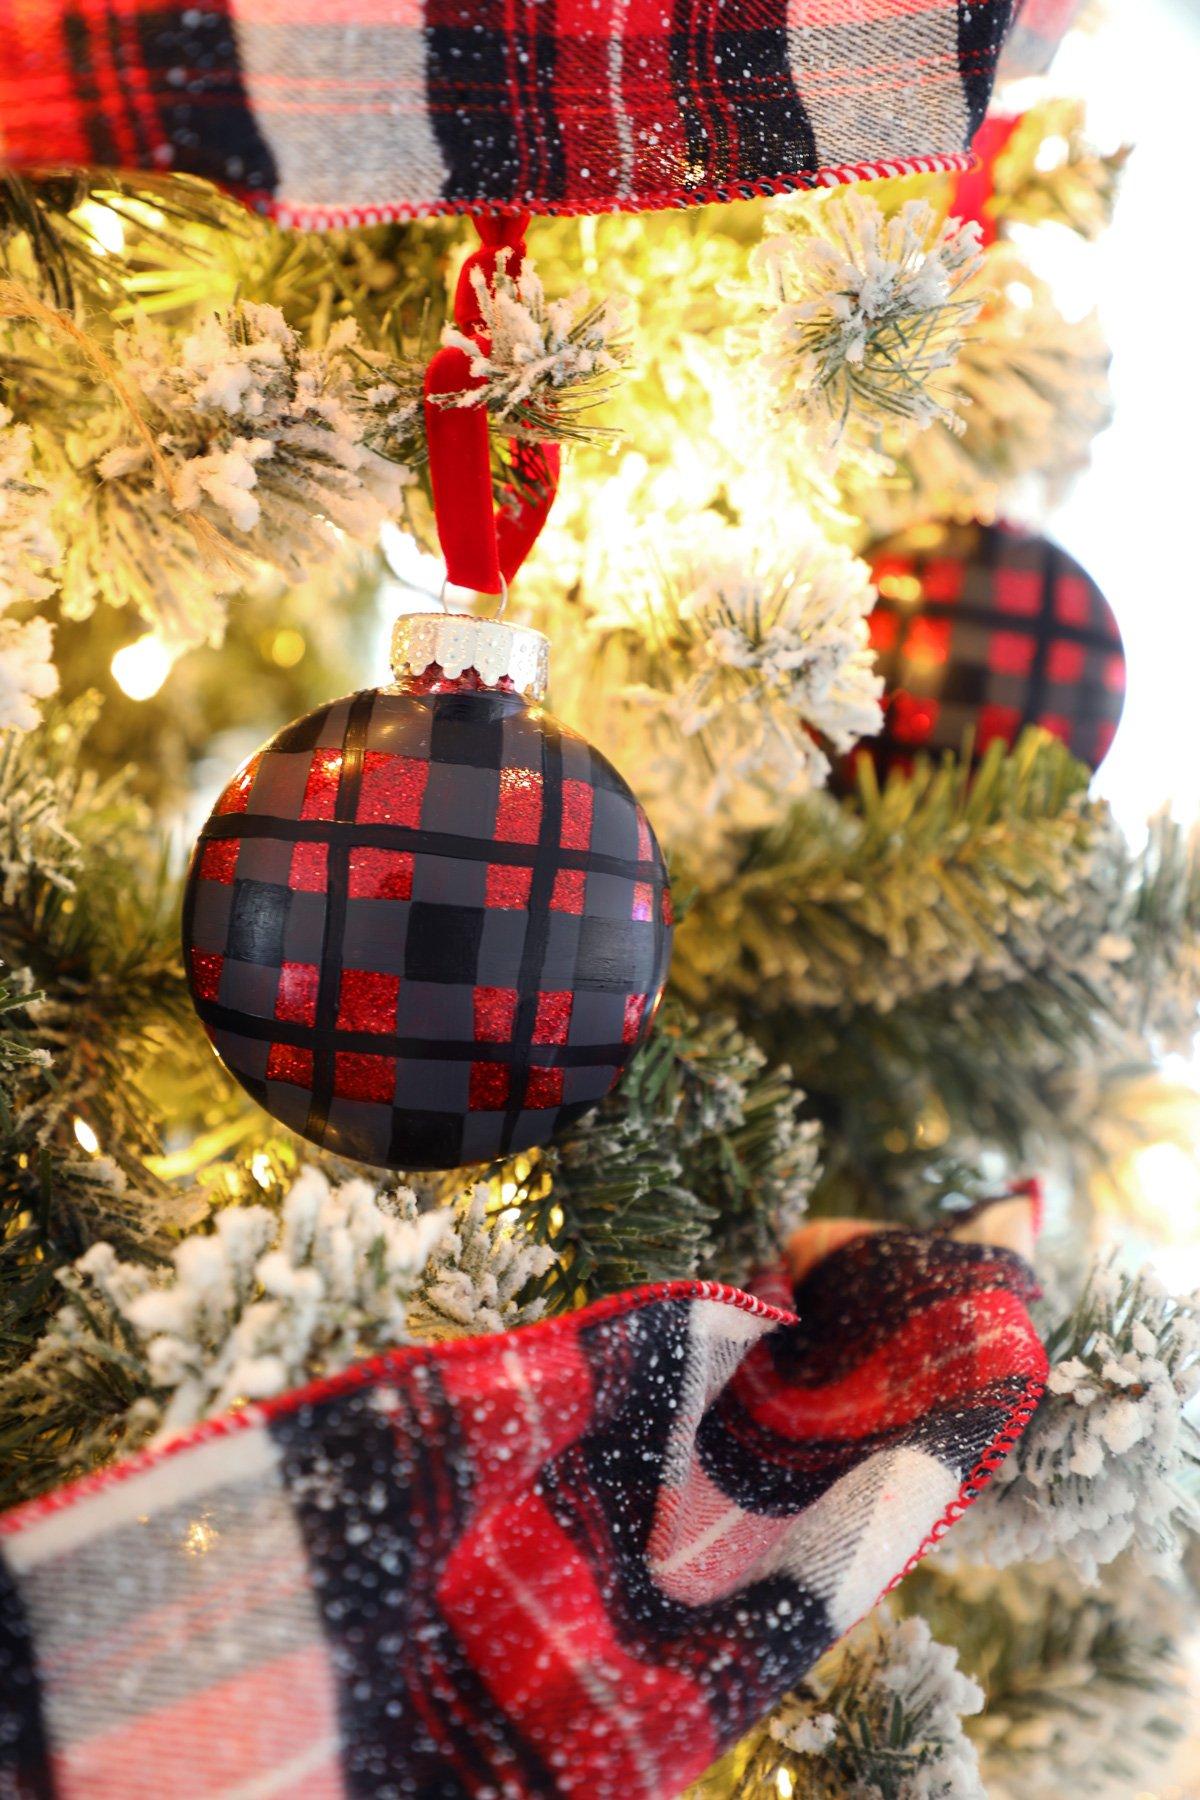 DIY Plaid Painted Ornaments